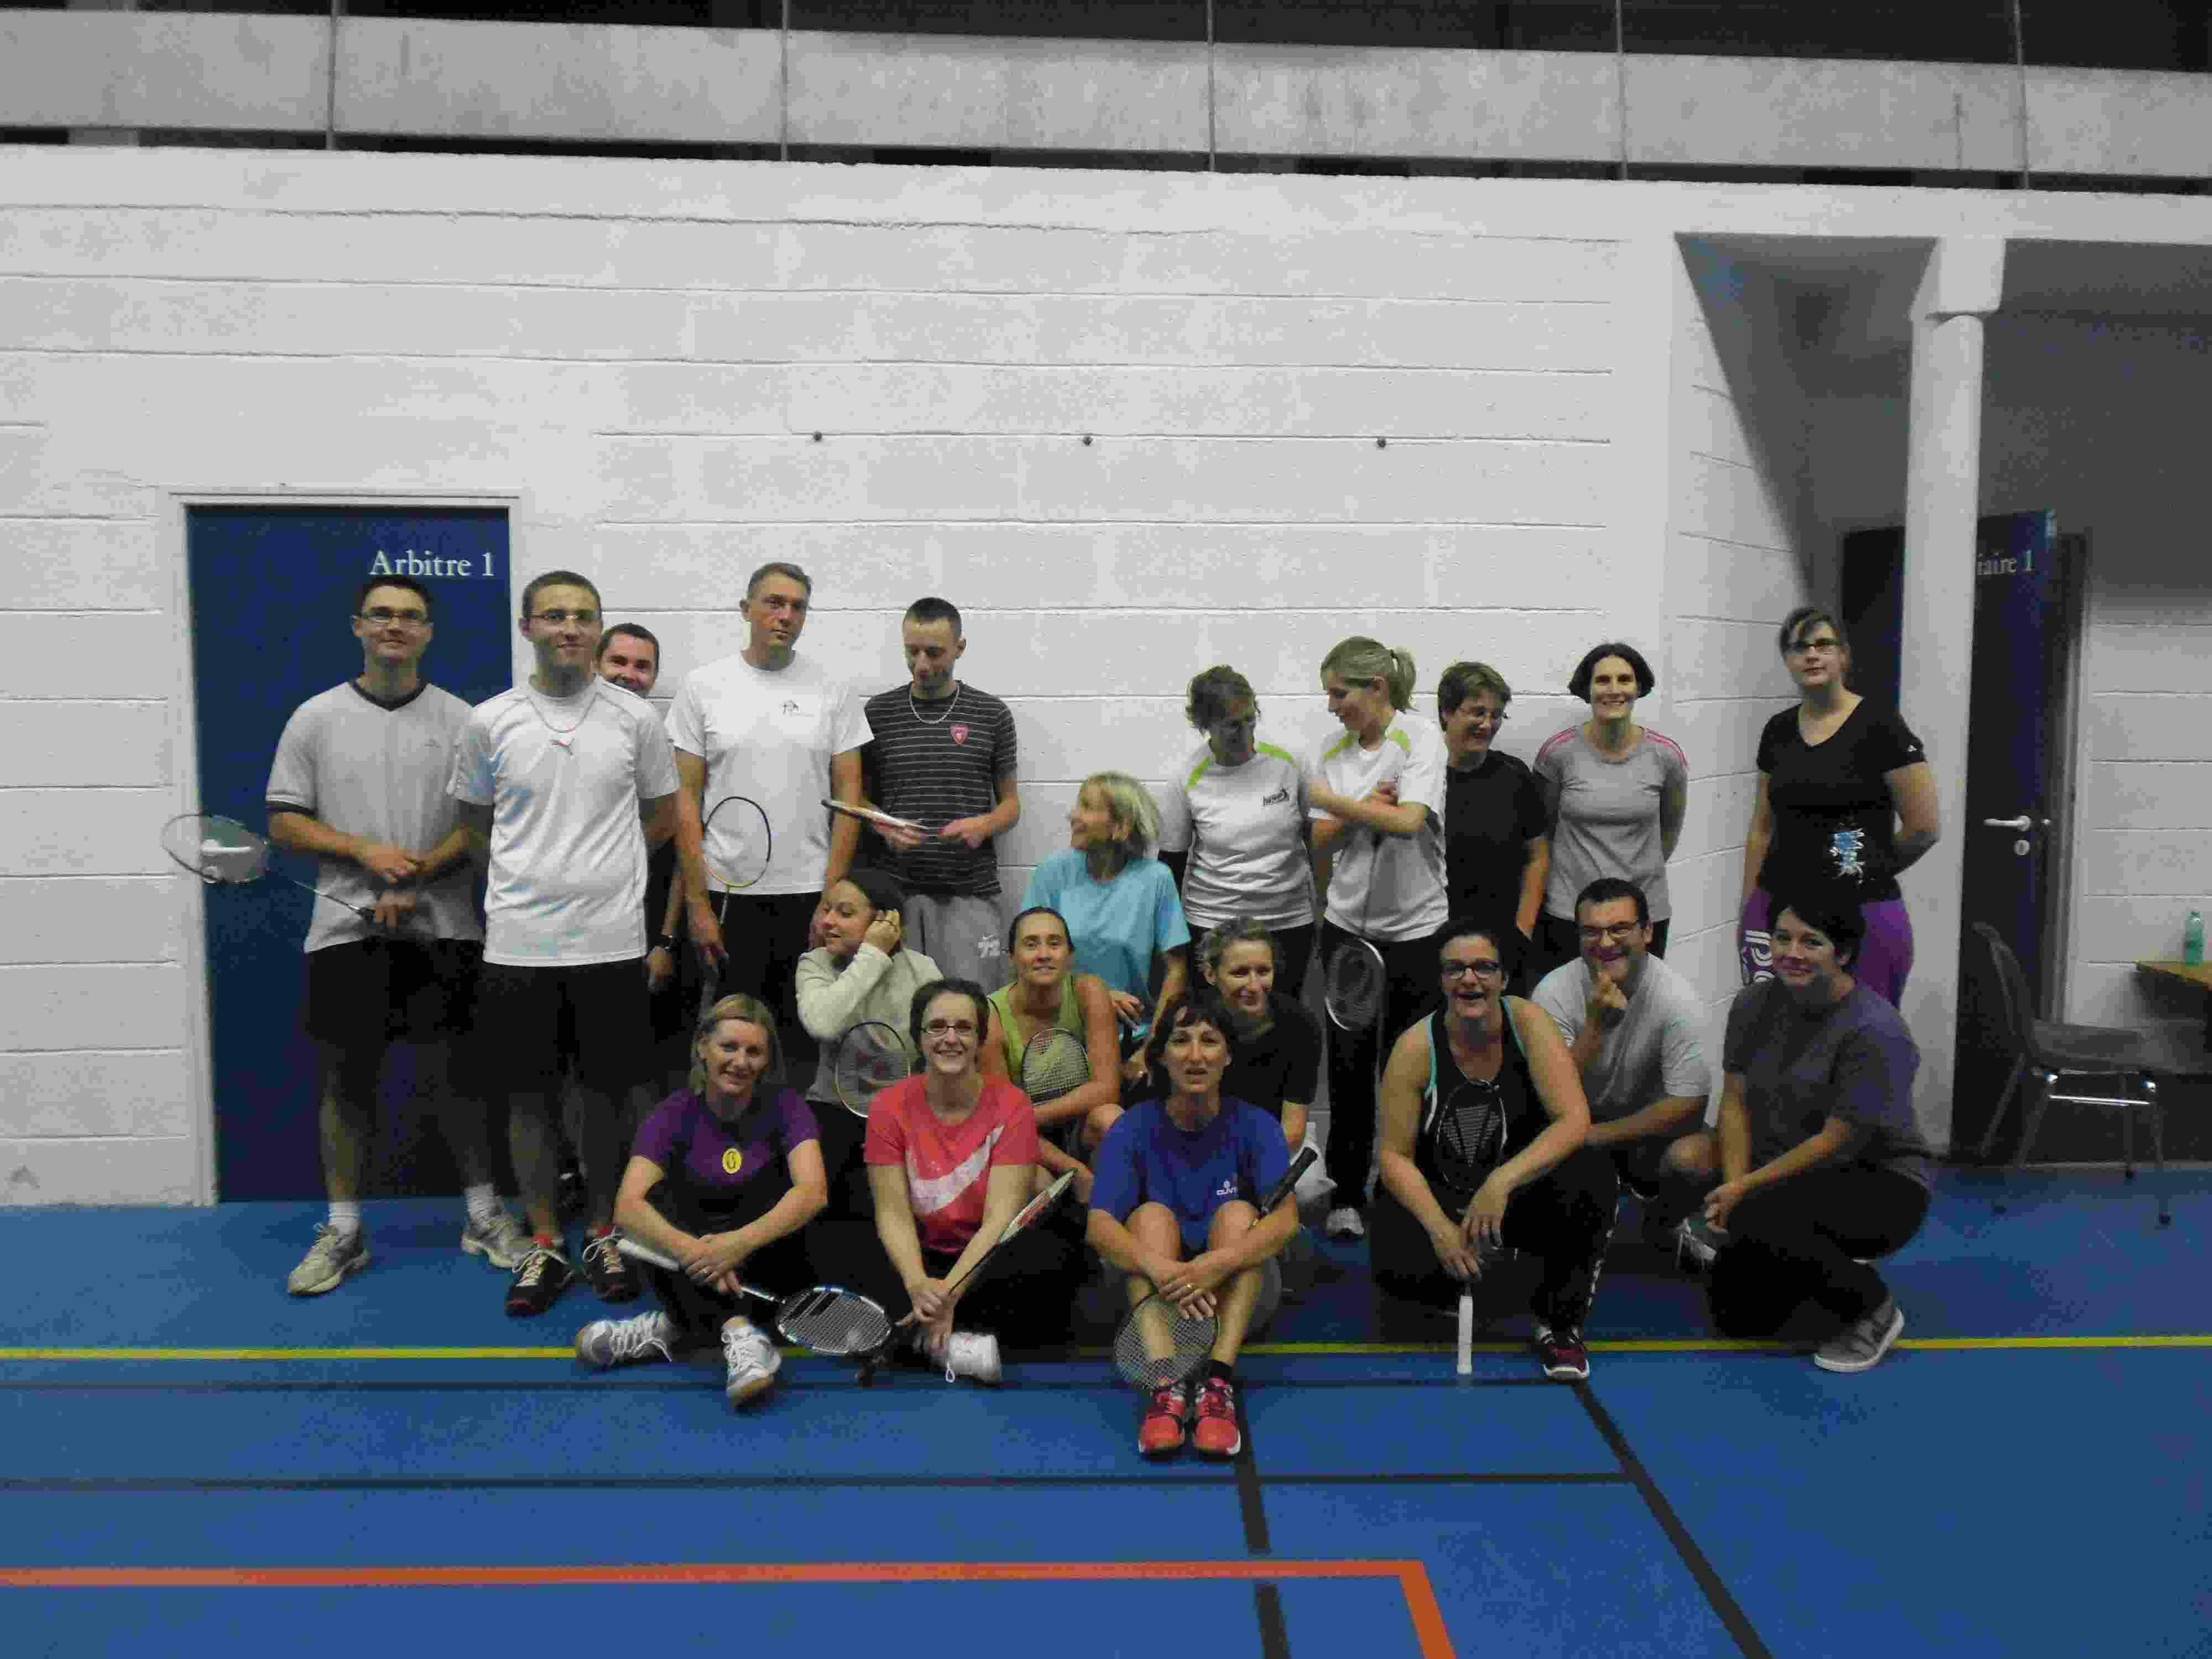 groupe-badminton-nuaillé-lundi